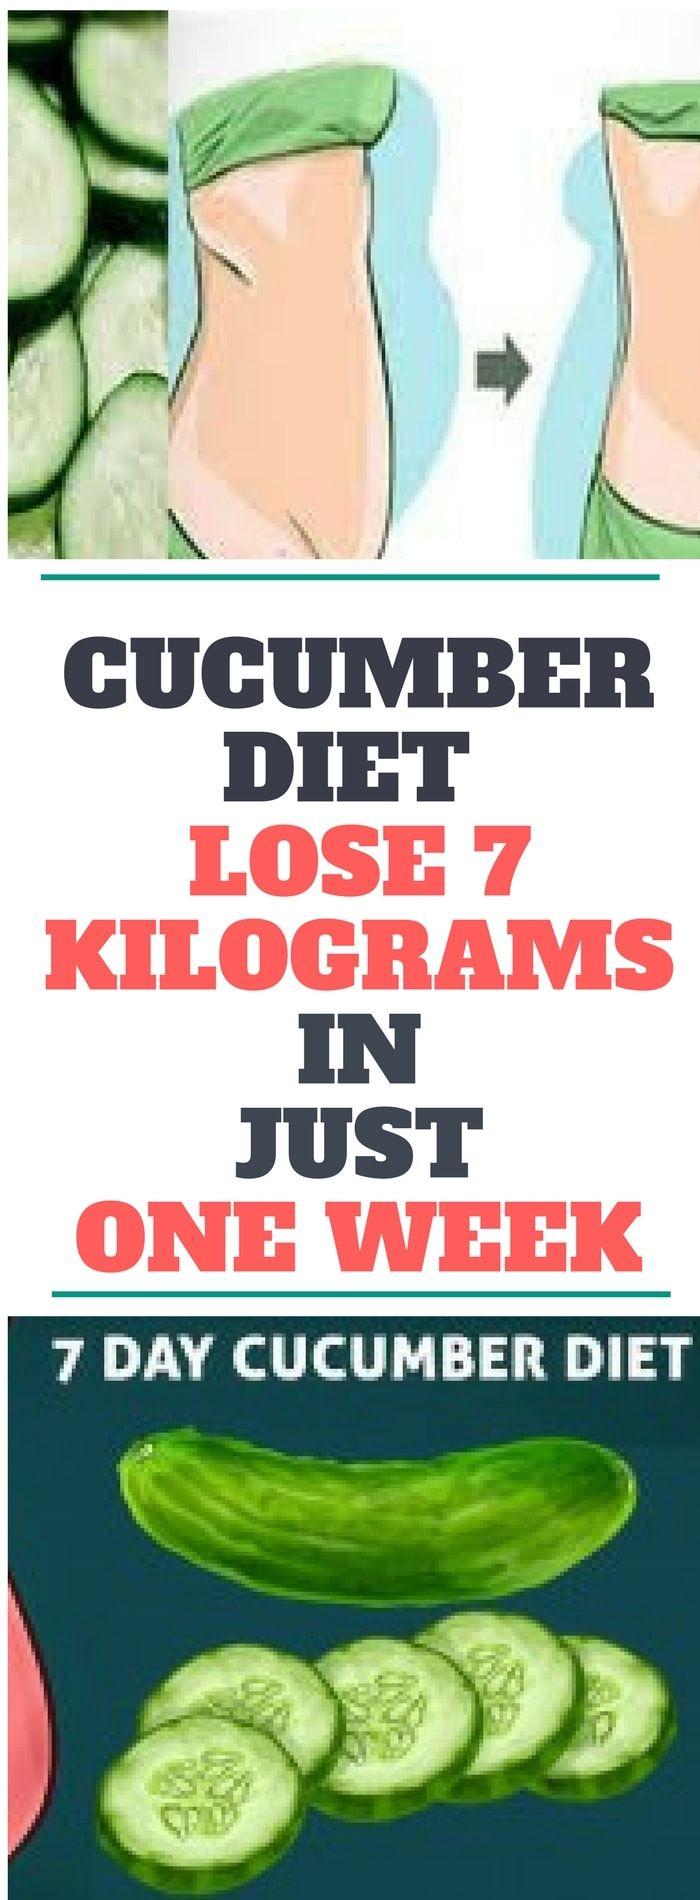 Cucumber Diet – Lose 7 Kilograms In Just One Week...! Need to know!! !!!